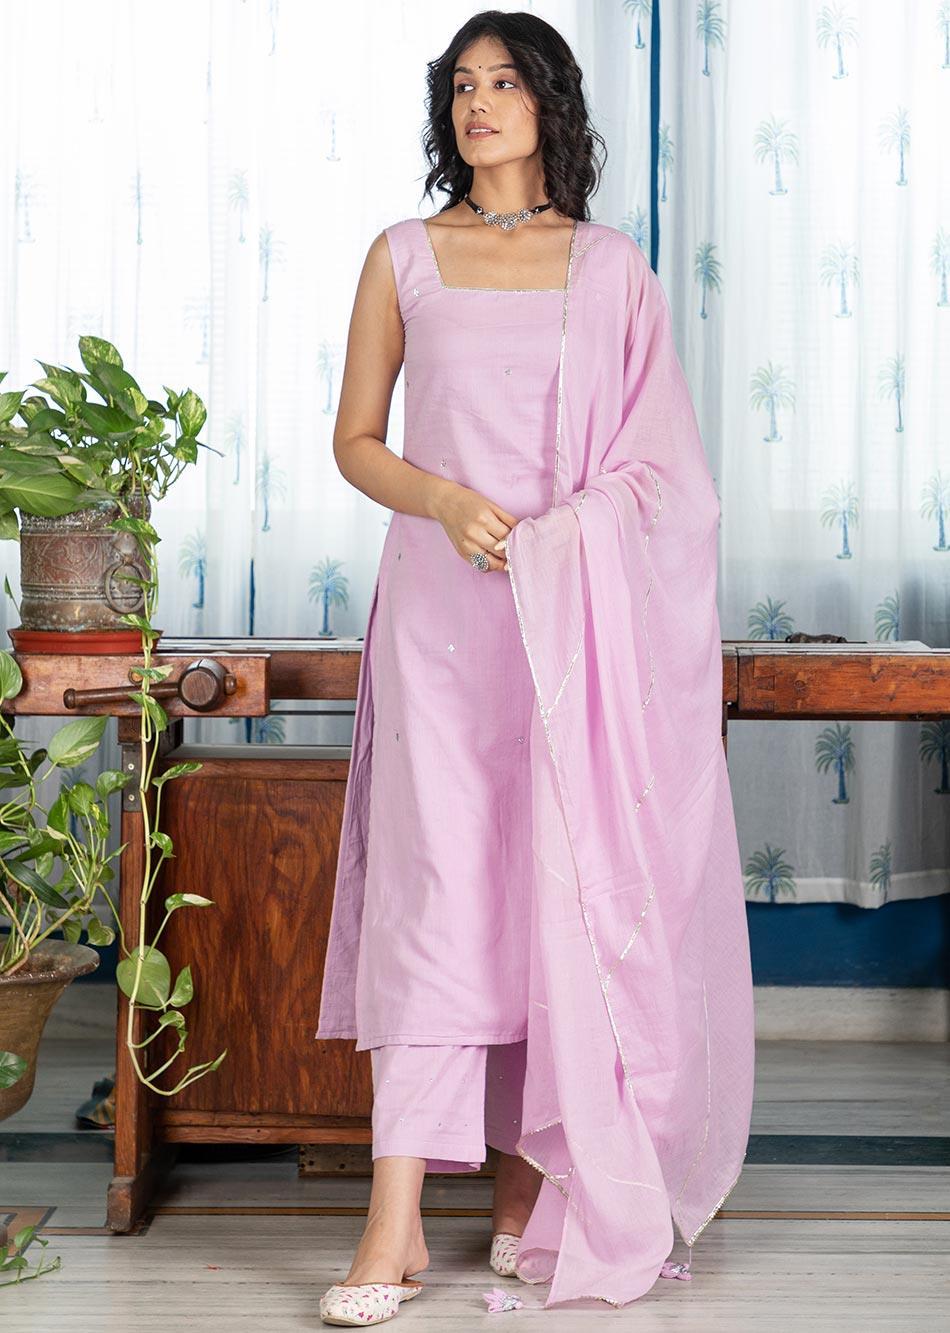 MOH Lilac Sleeveless Kurta (only kurta) By Jovi Fashion